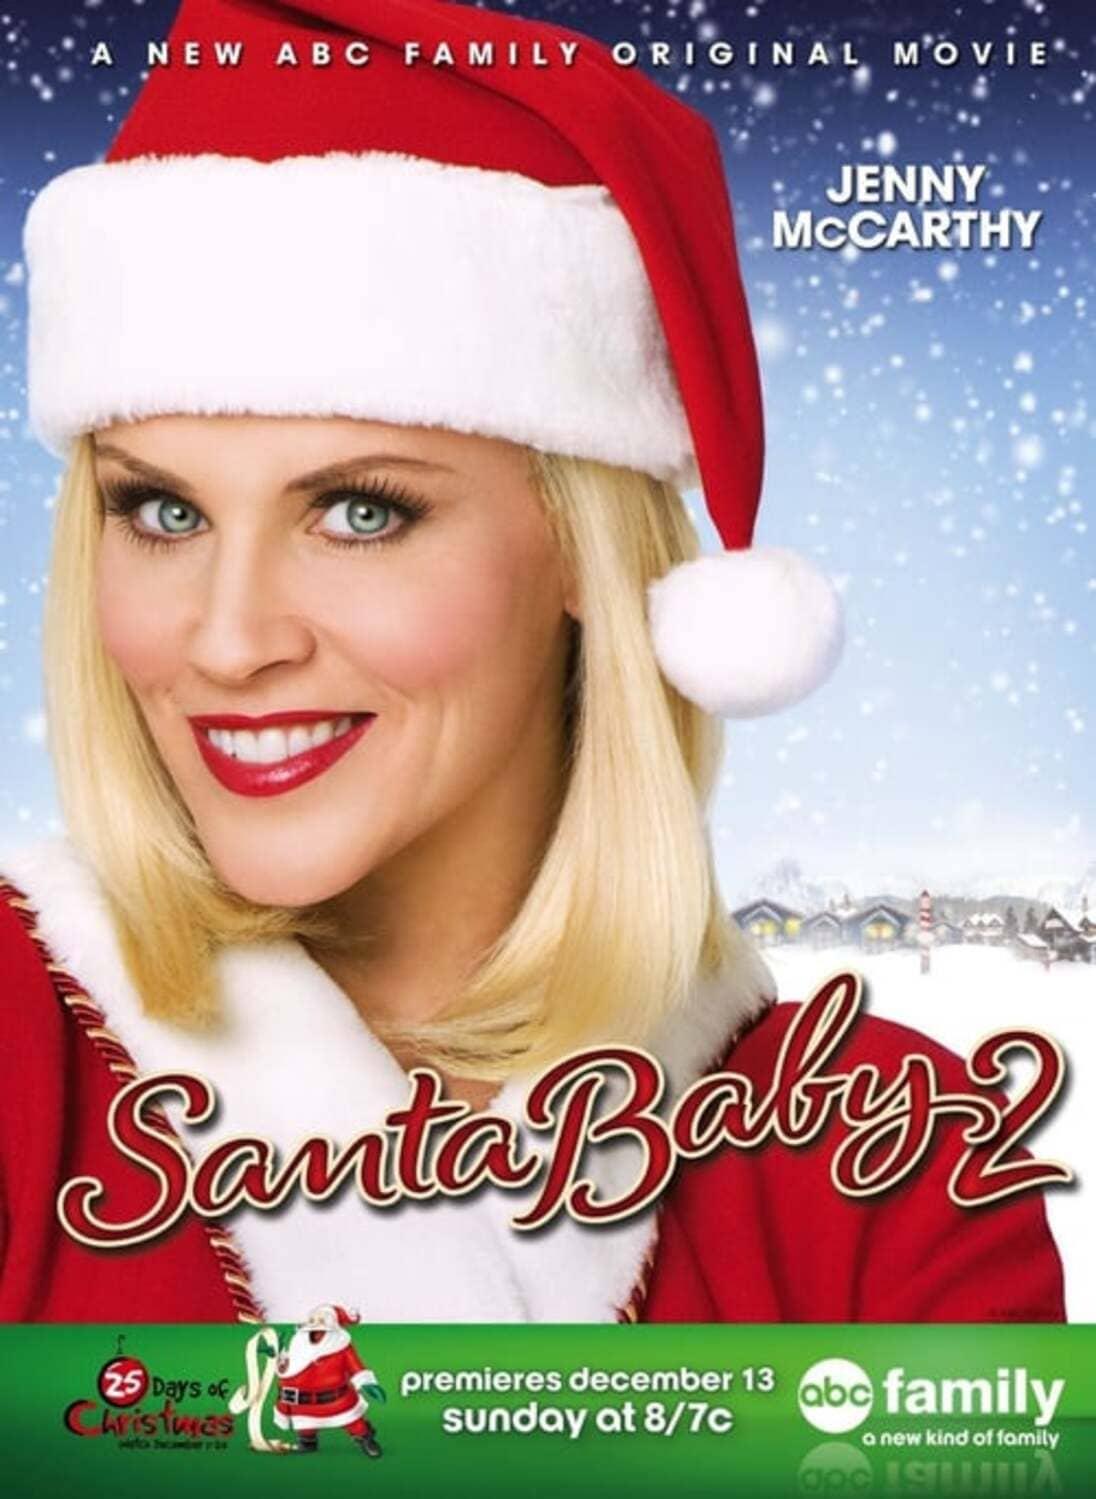 affiche poster fille pere noel 2 panique polaris santa baby christmas disney